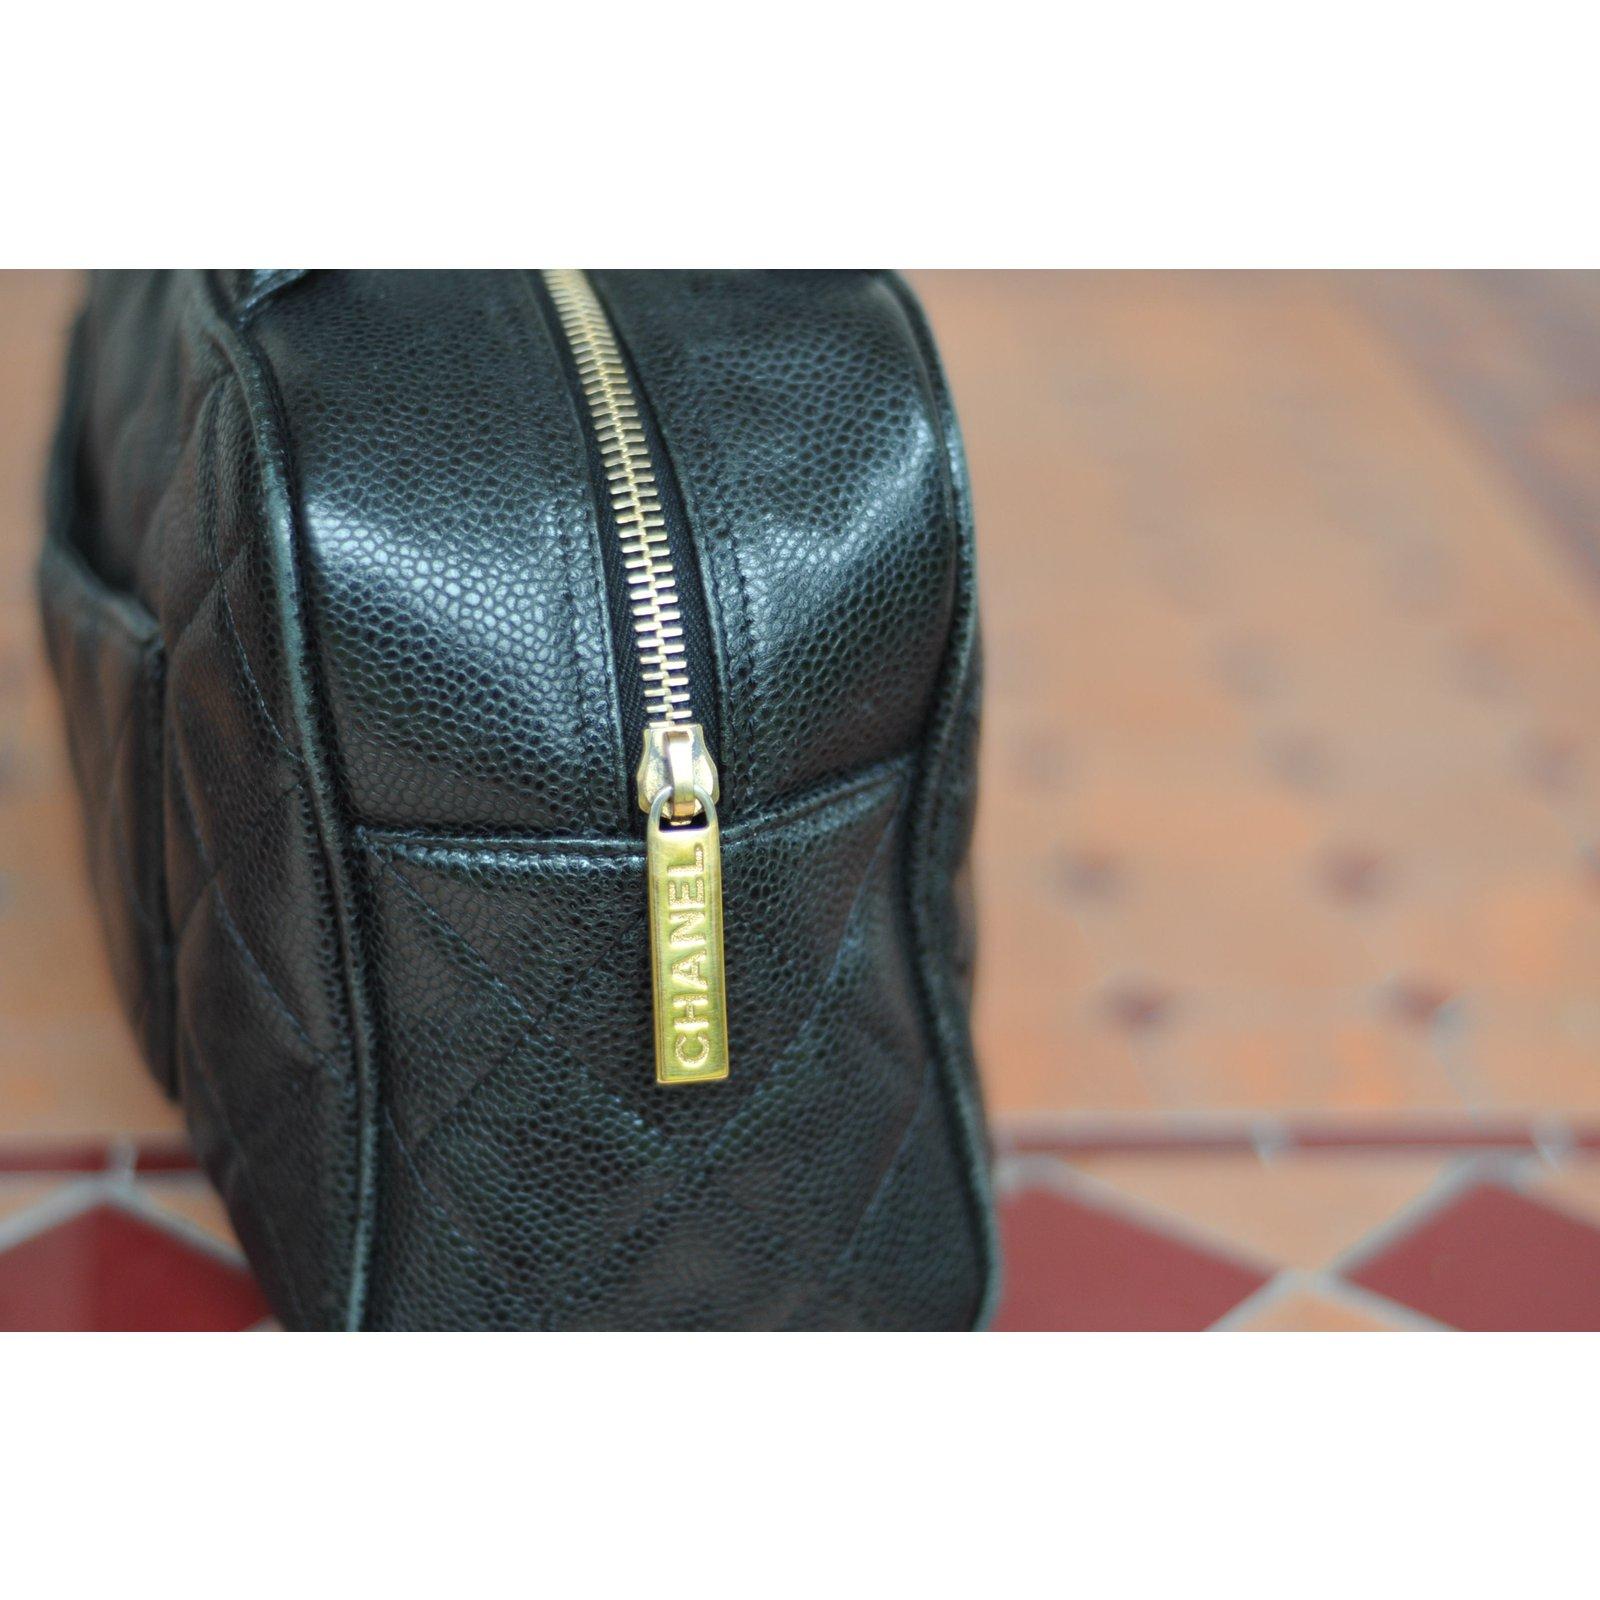 Chanel Vintage Bowling Bag Handbags Leather Black Ref 65221 Joli Closet